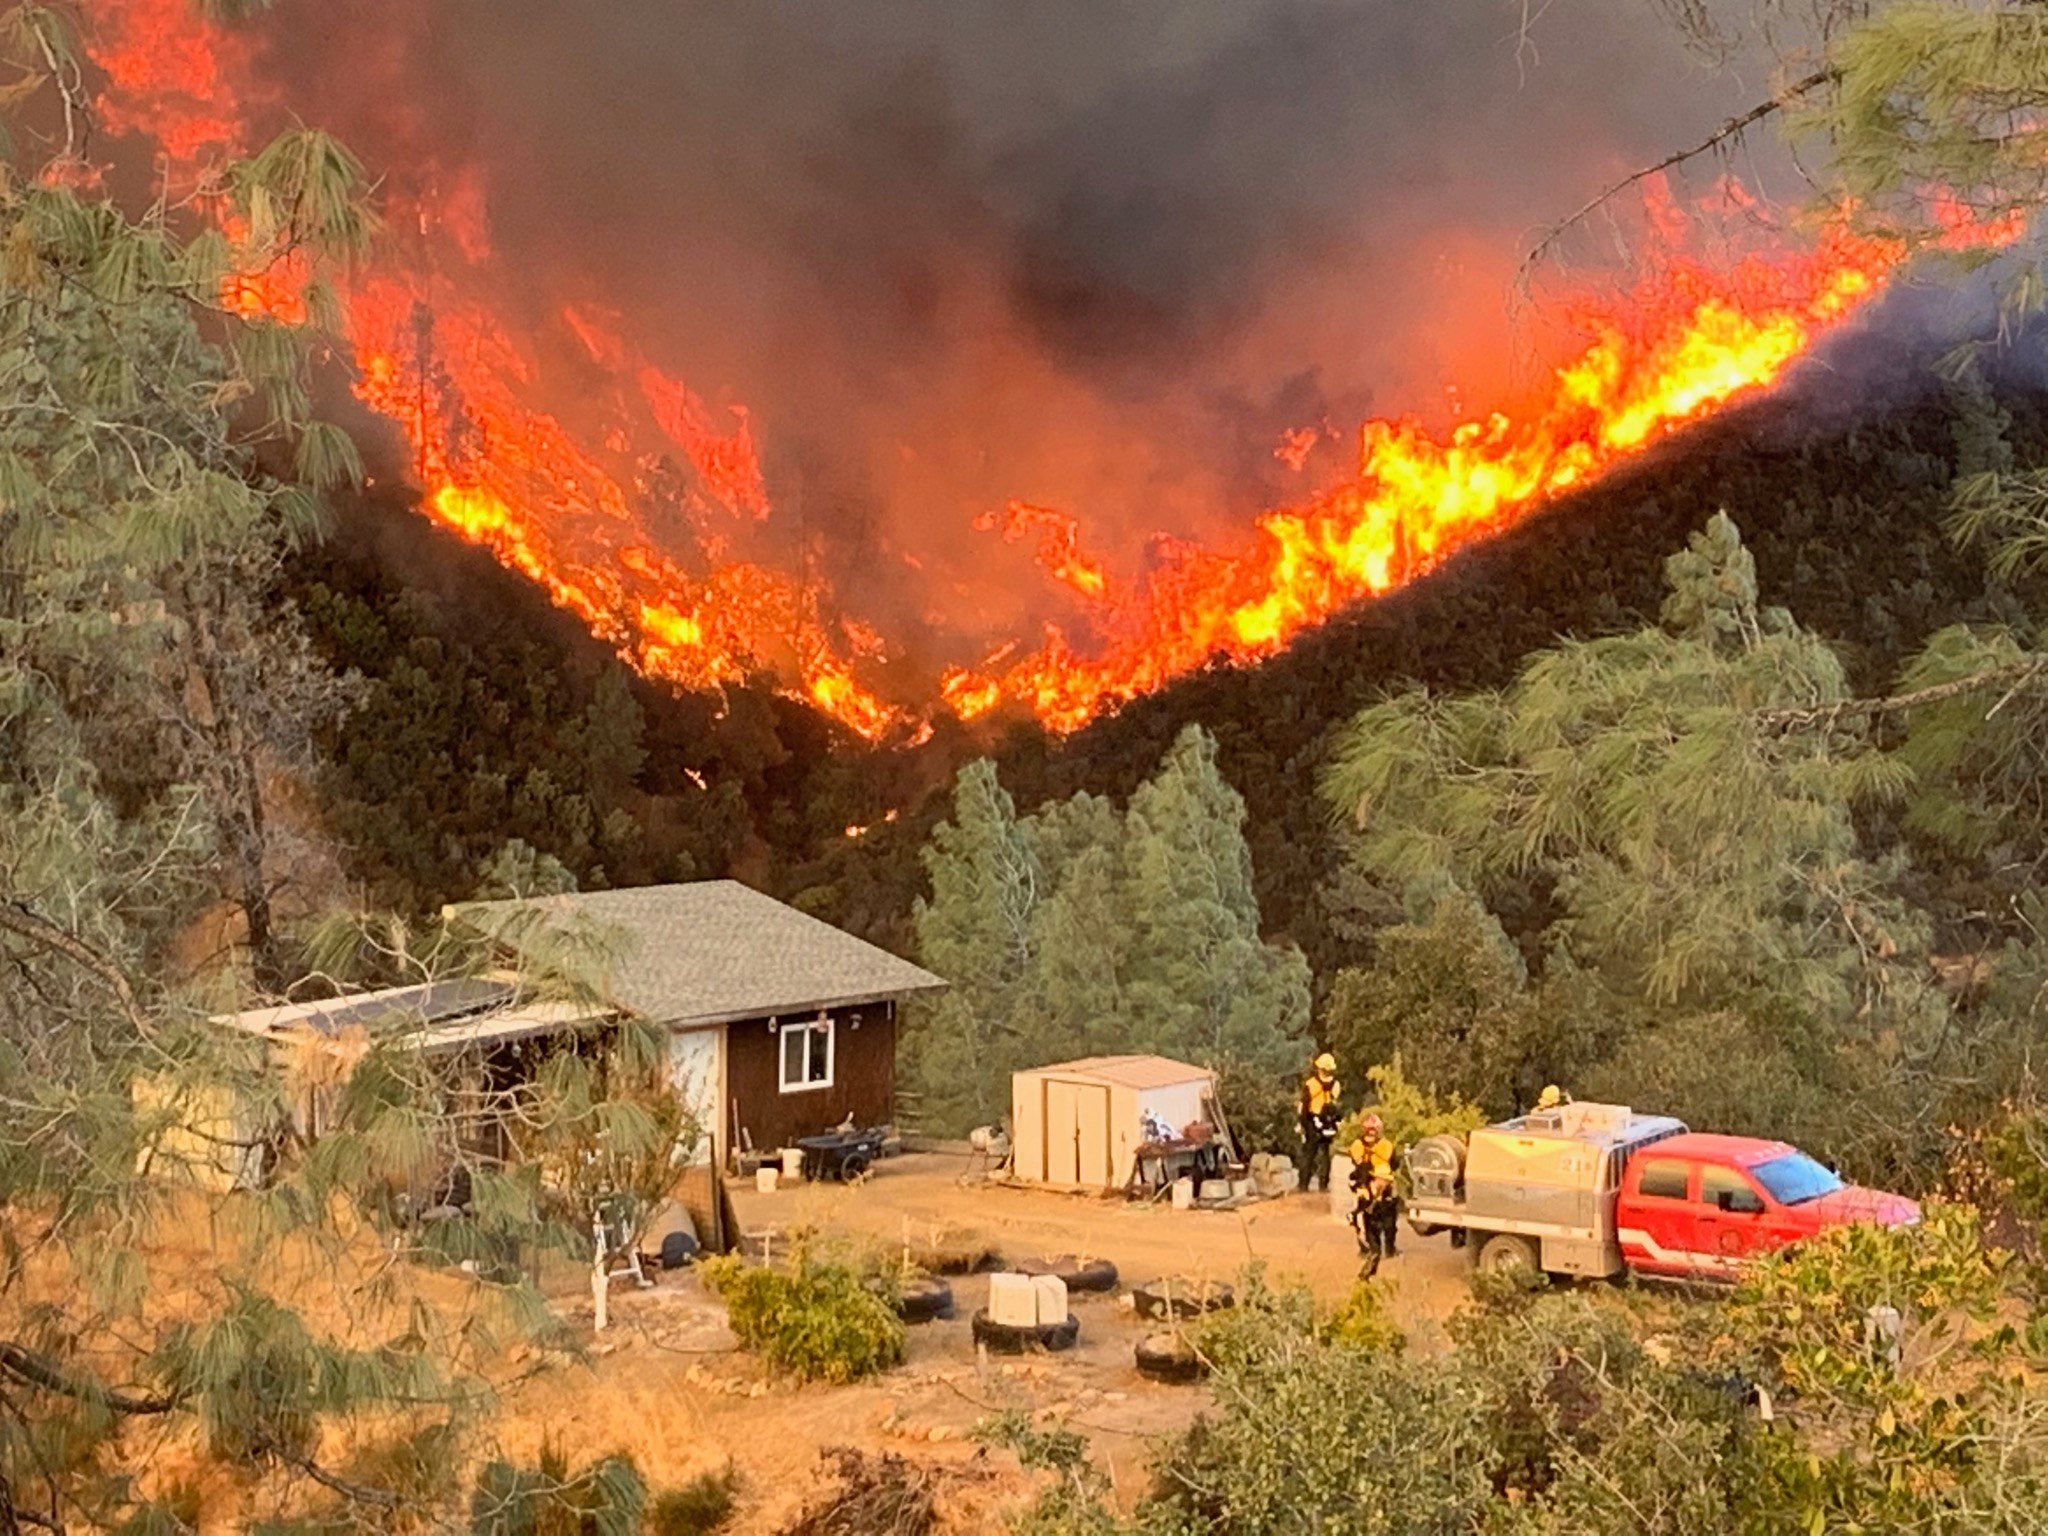 Crews Fire near Gilroy reaches 90% containment on sixth